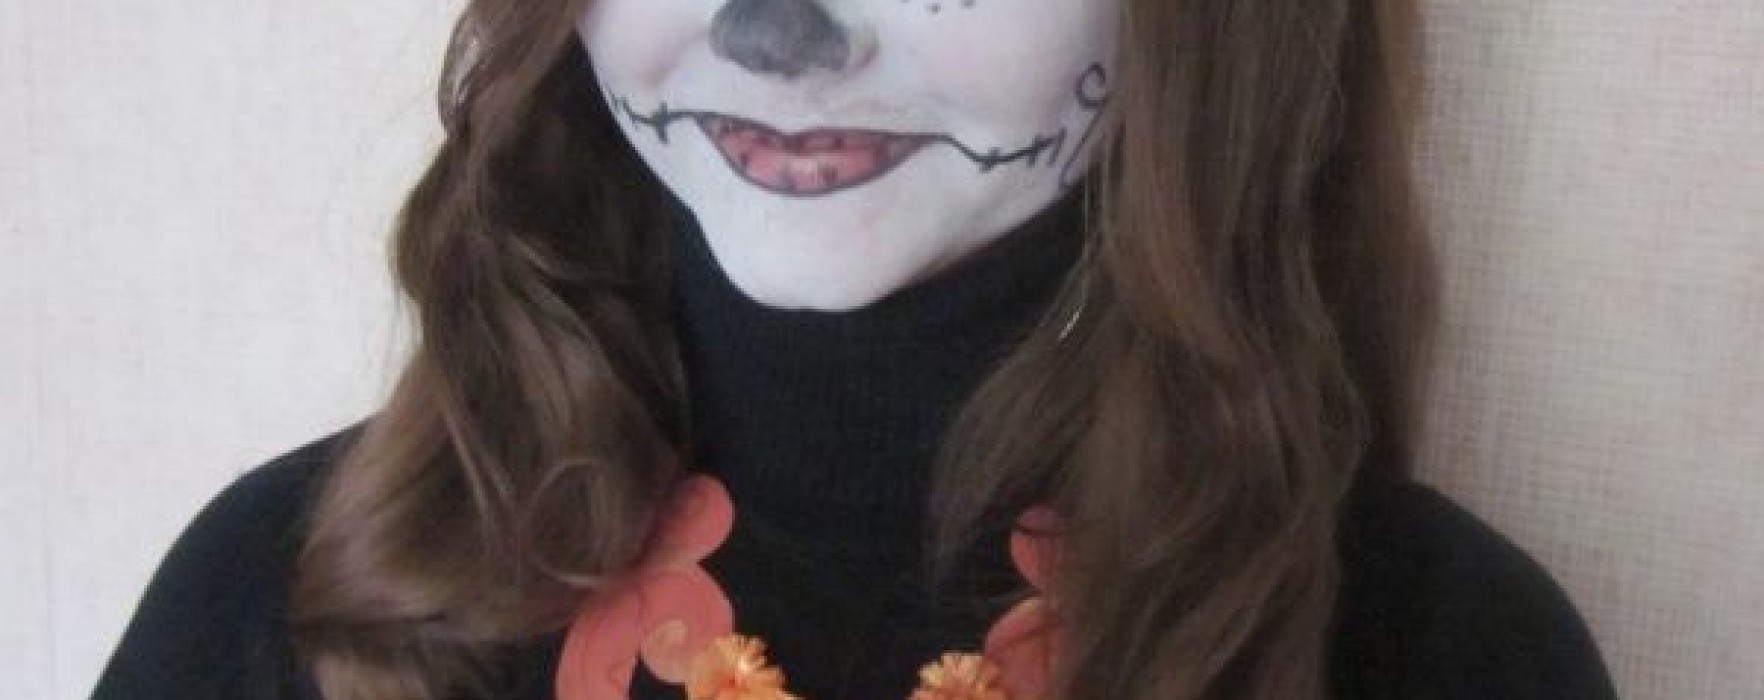 Monster High Party 3 этап — работа Лизы Артемьевой